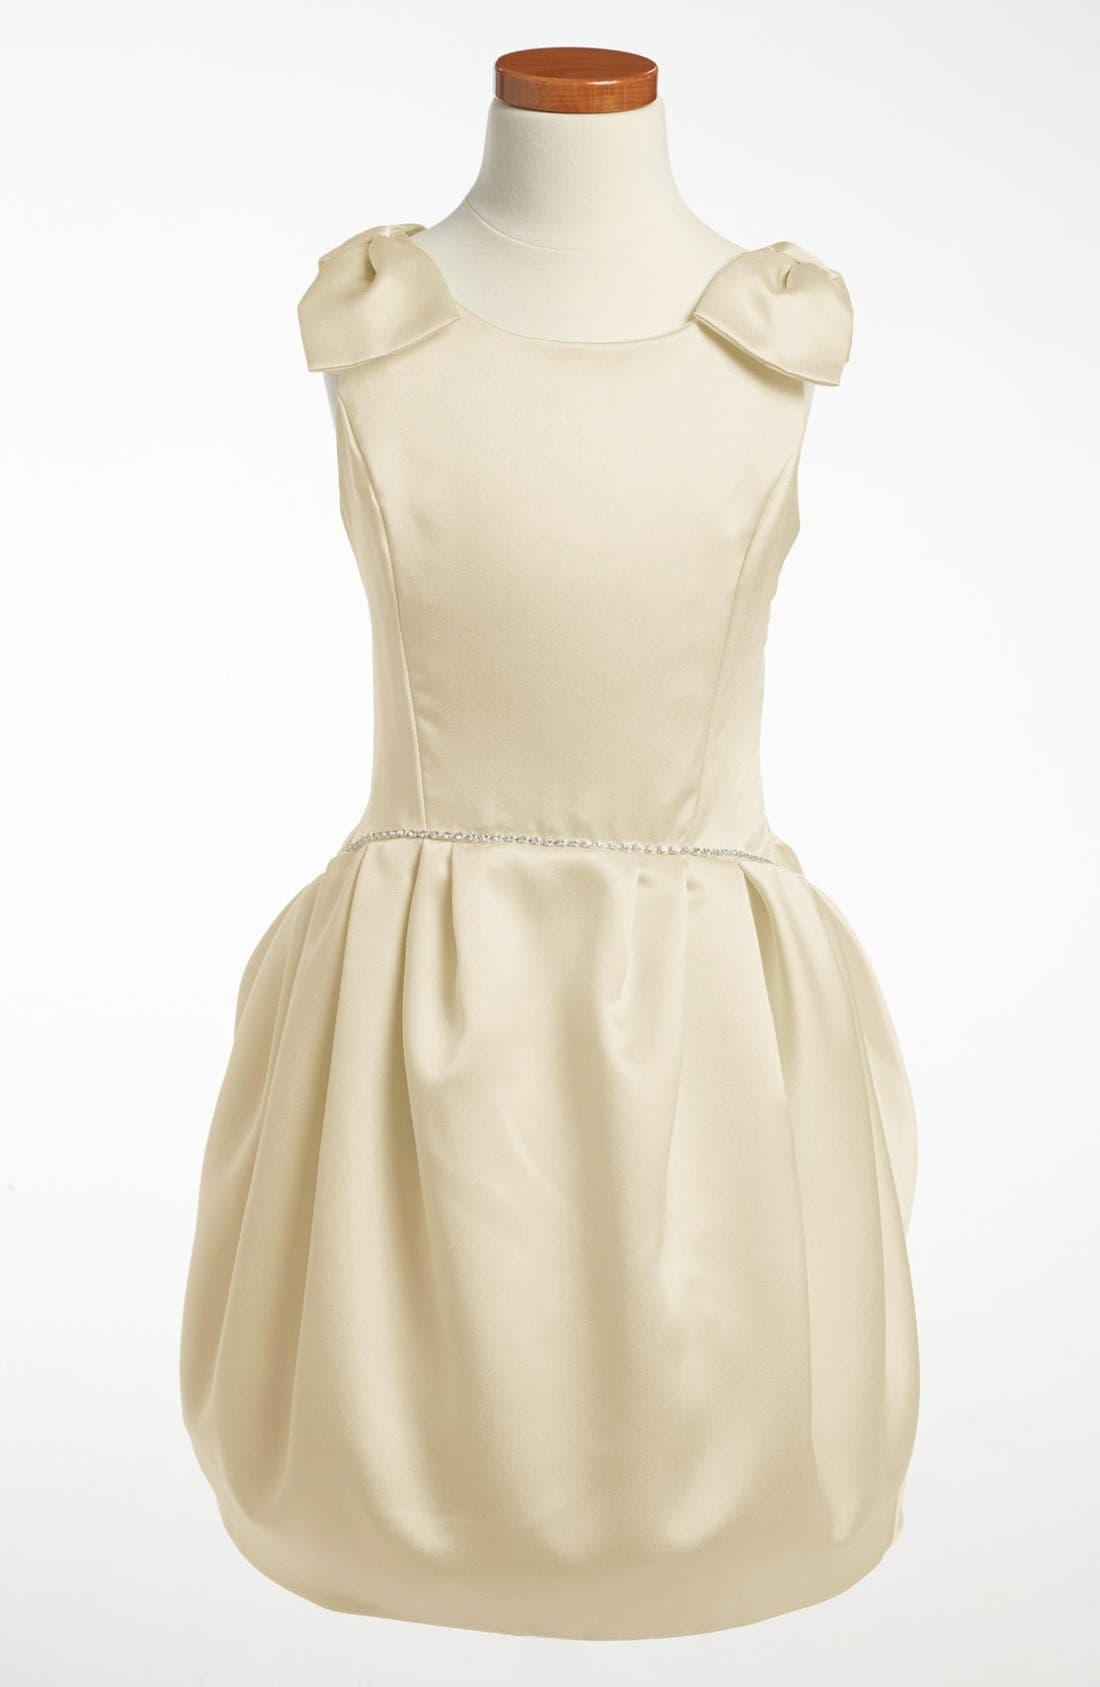 Alternate Image 1 Selected - La Piccola Danza Kidswear Satin Pleated Dress (Little Girls & Big Girls)